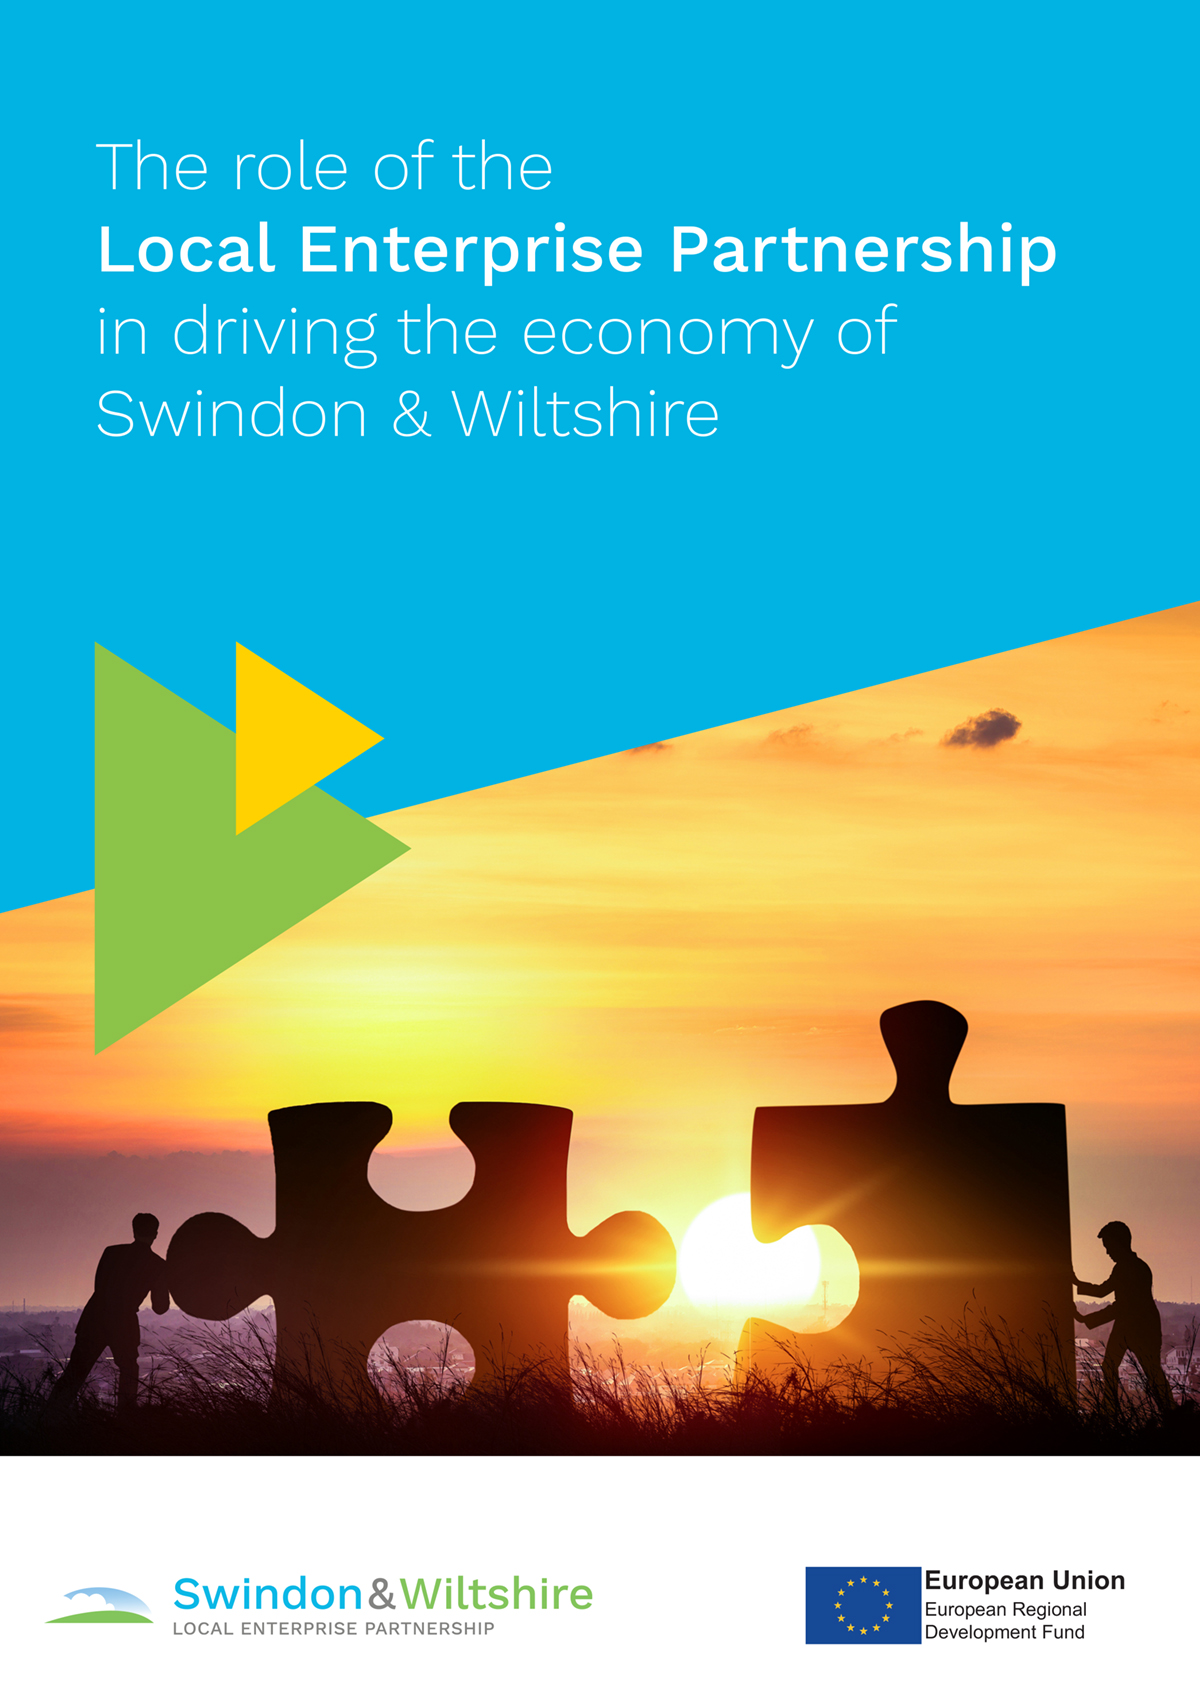 Swindon & Wiltshire LEP